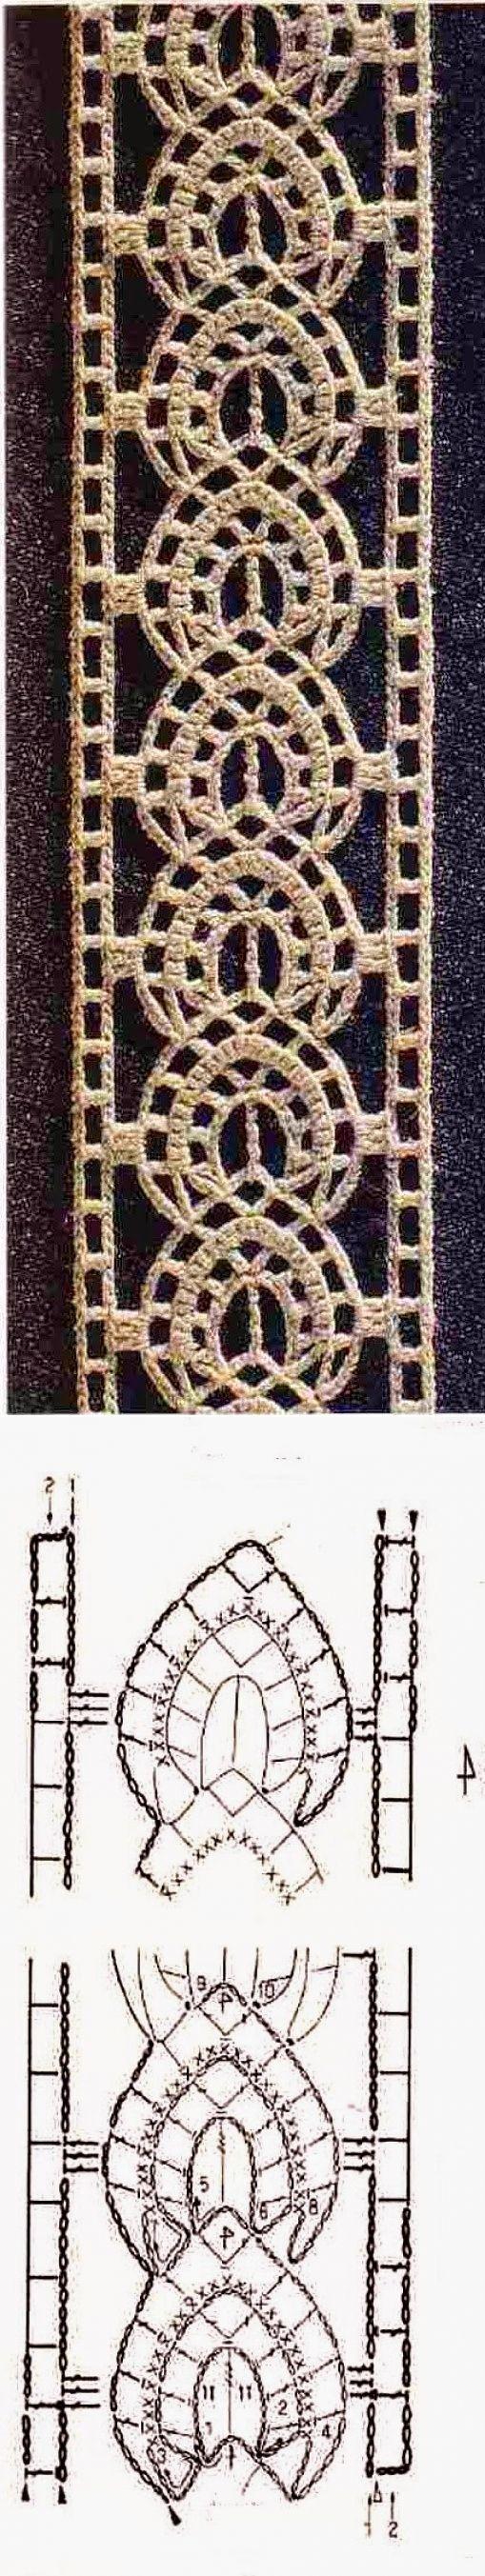 Crochet lace insertion worked sideways ~~ Ivelise Feito à Mão: tirinha ou entremeio